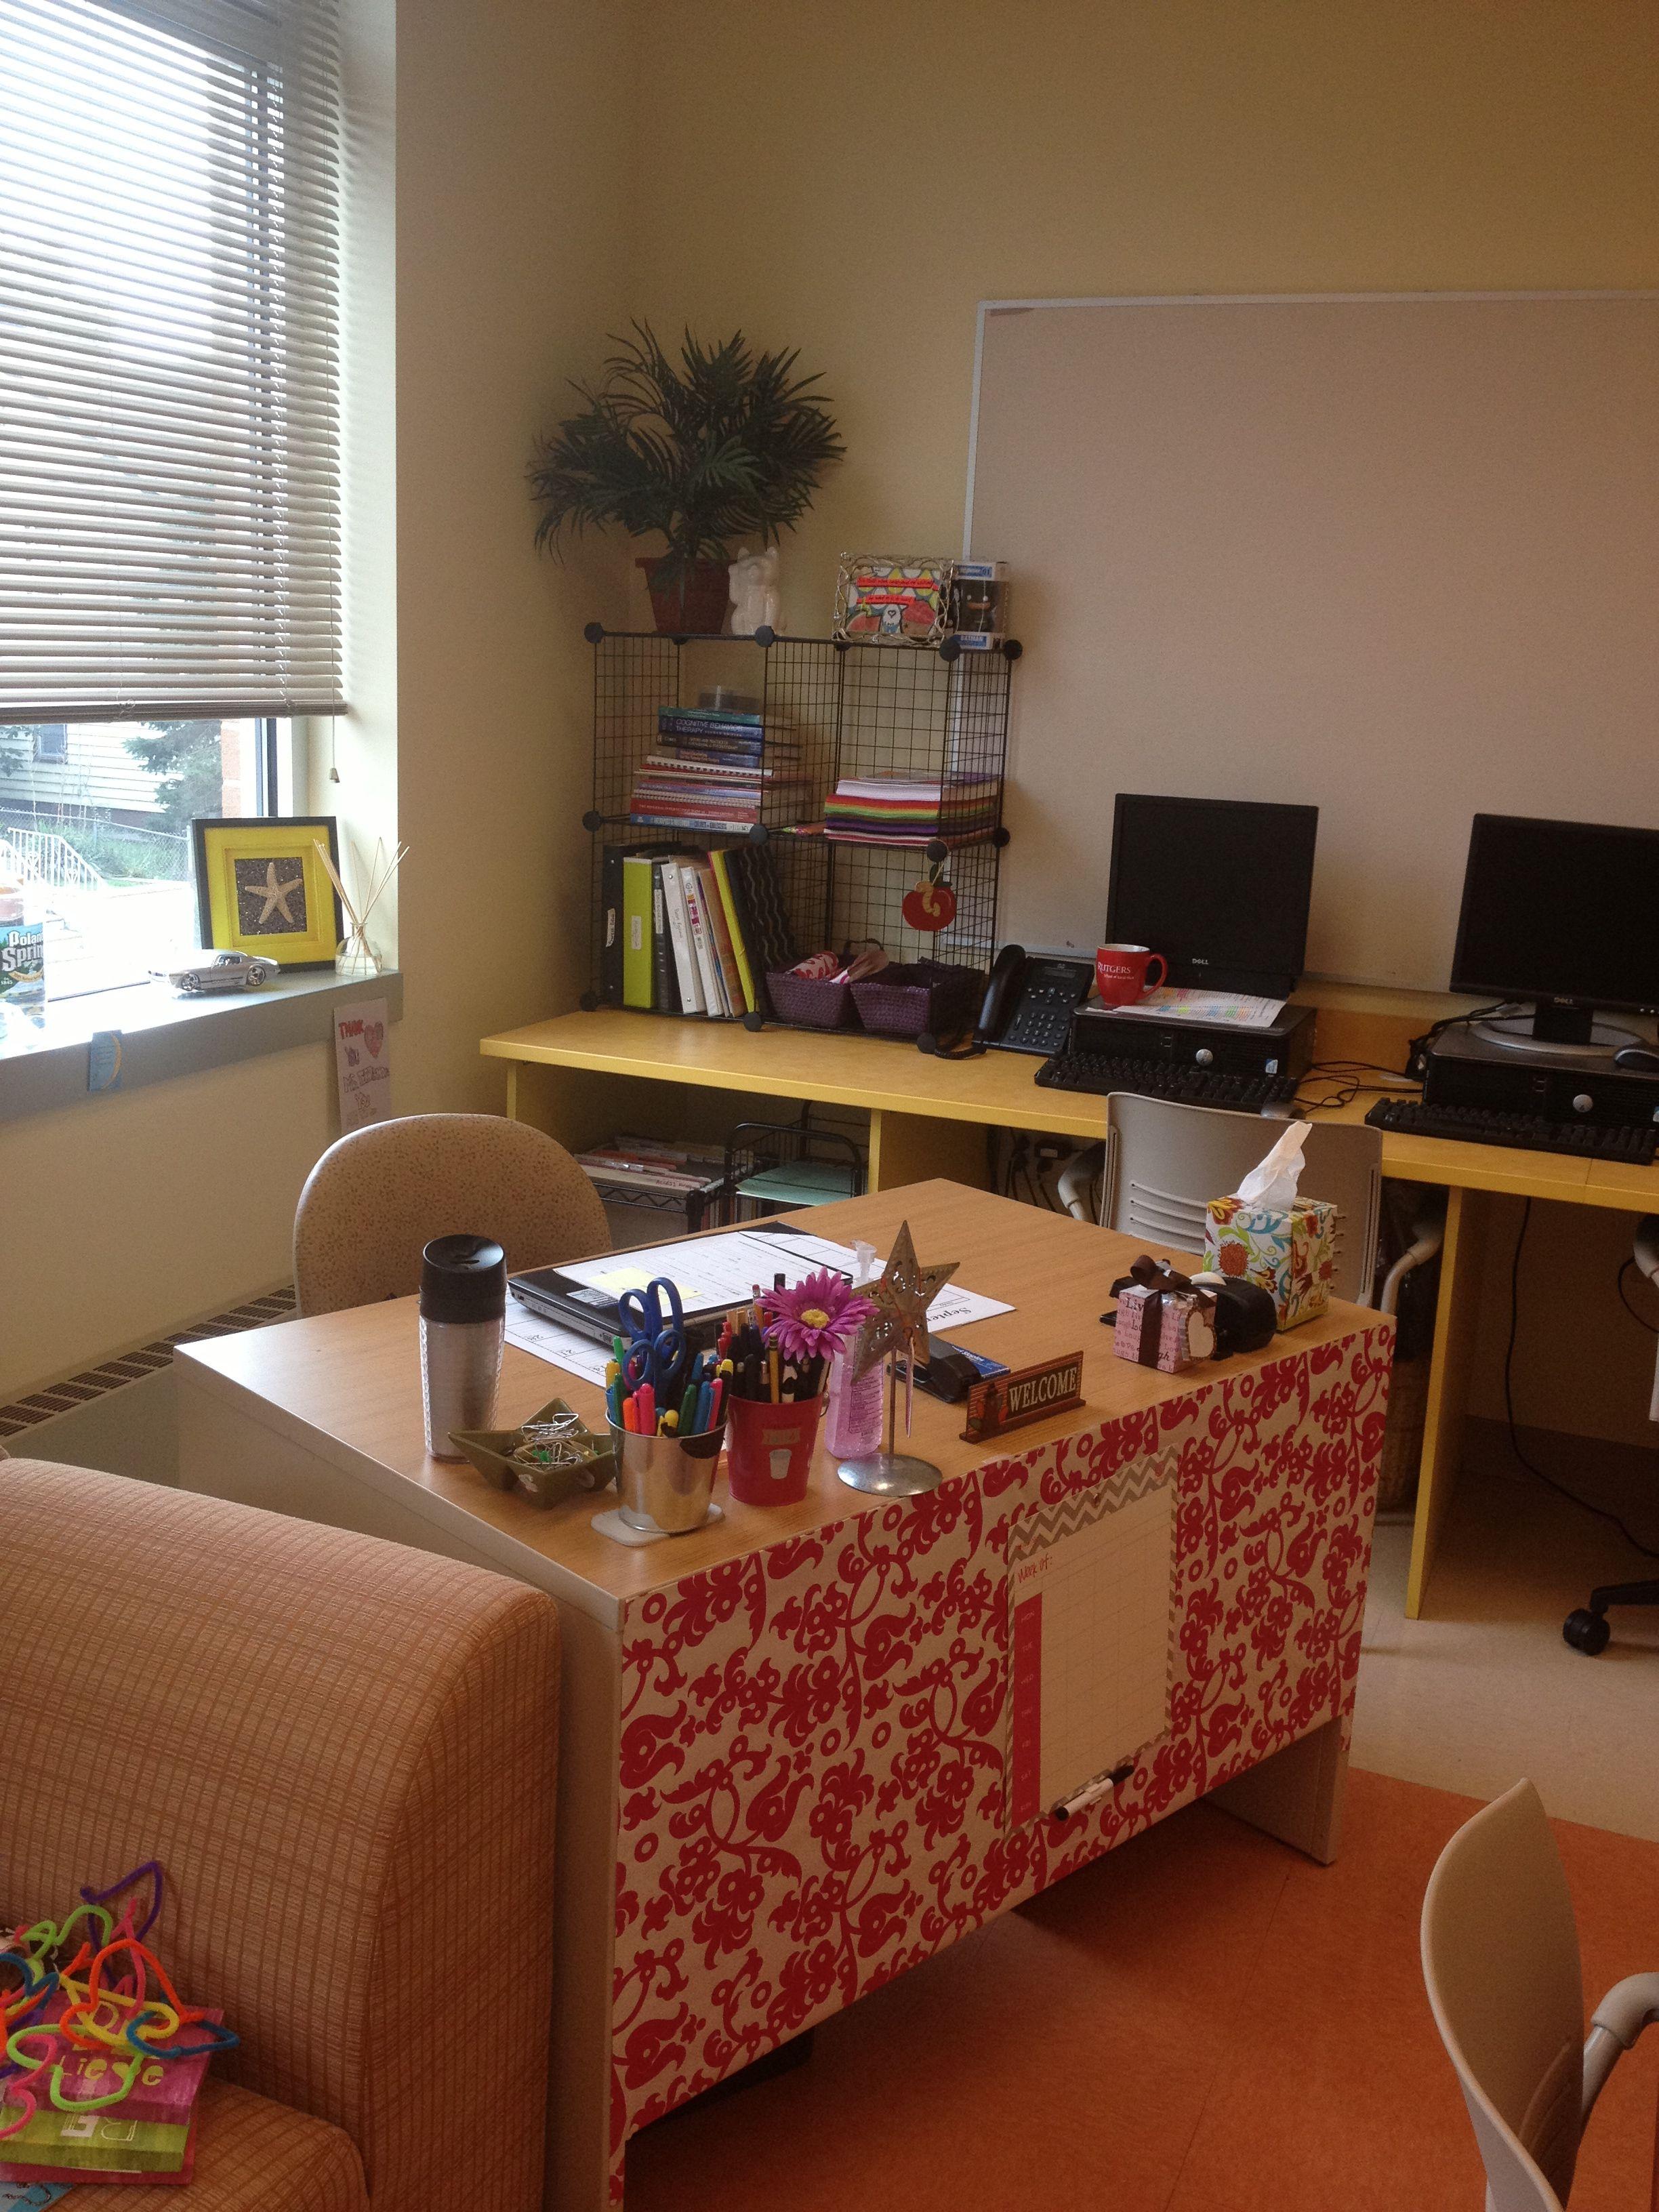 School counselor office Counselor Office Ideas School